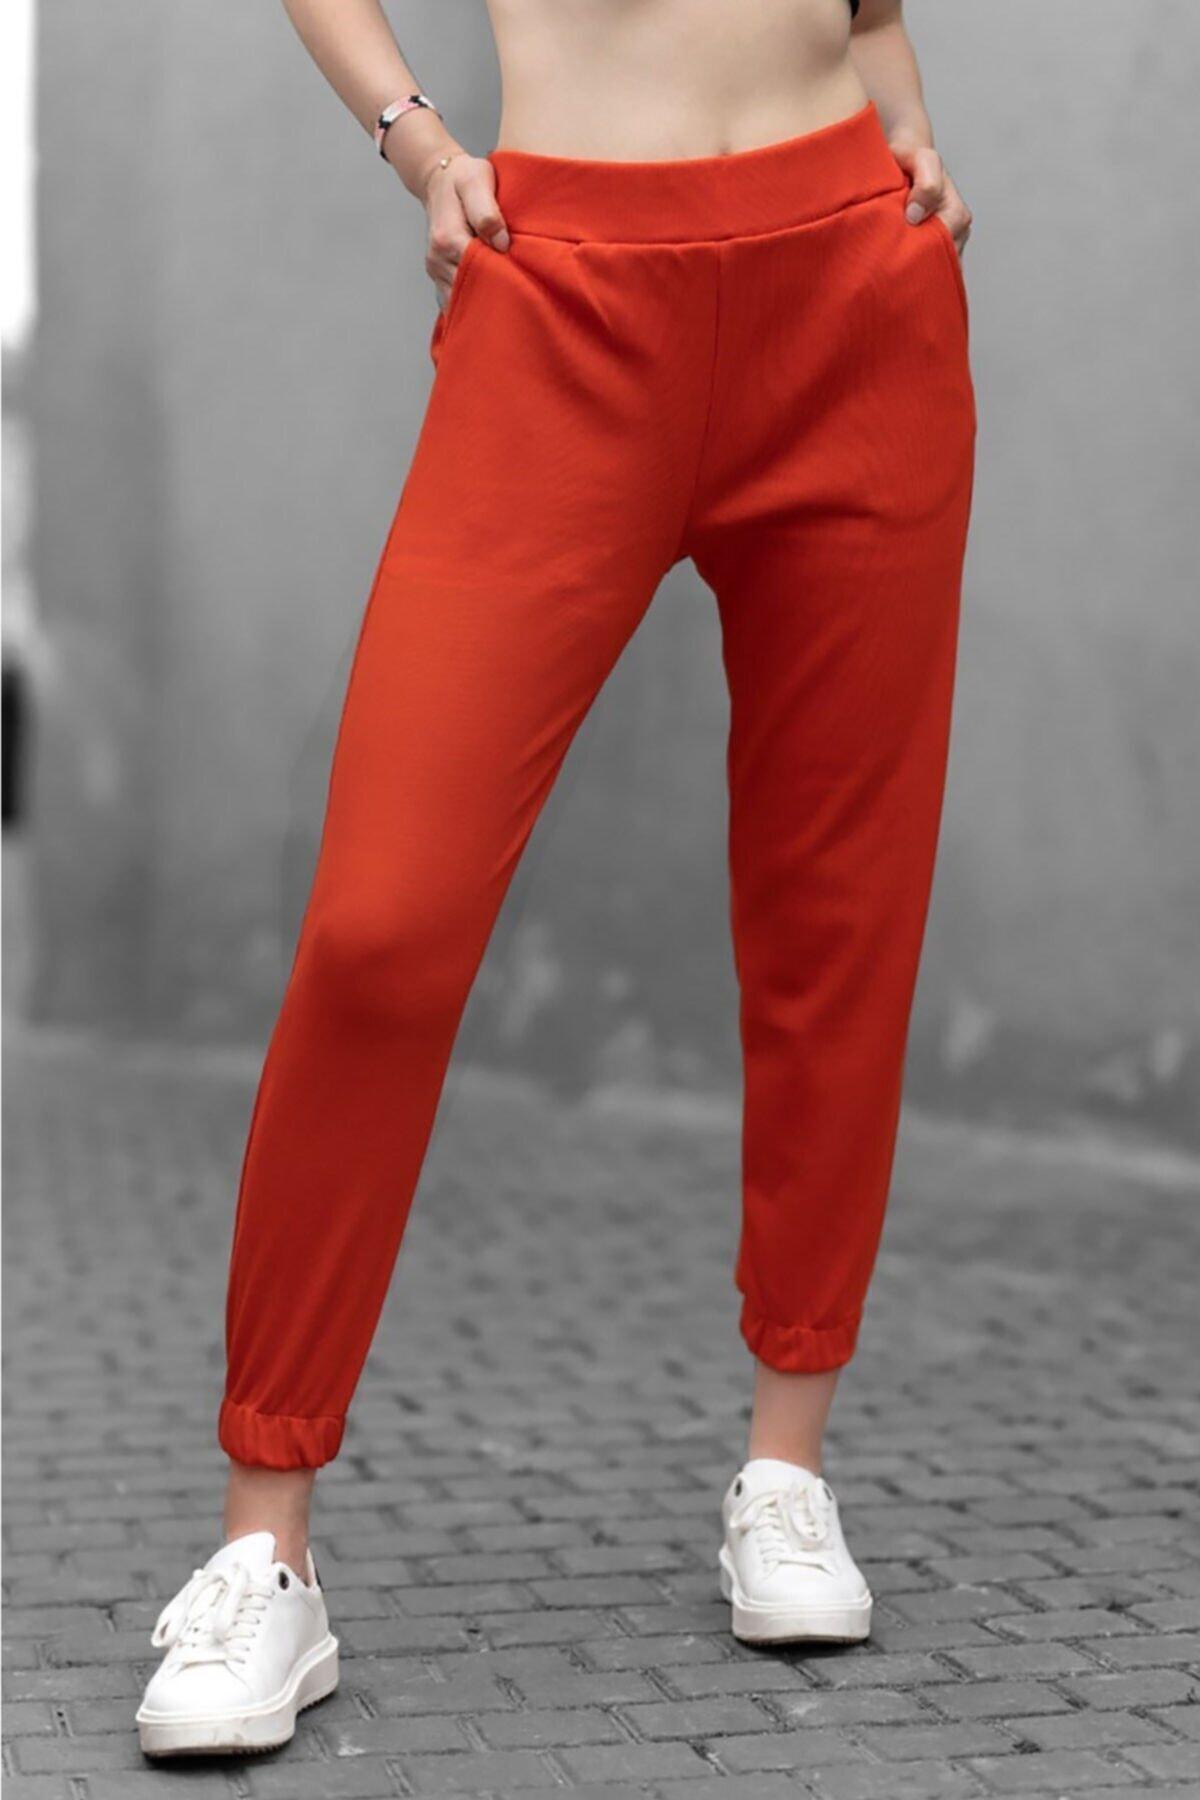 Kadın Turuncu Fitilli Basic Eşofman MG363